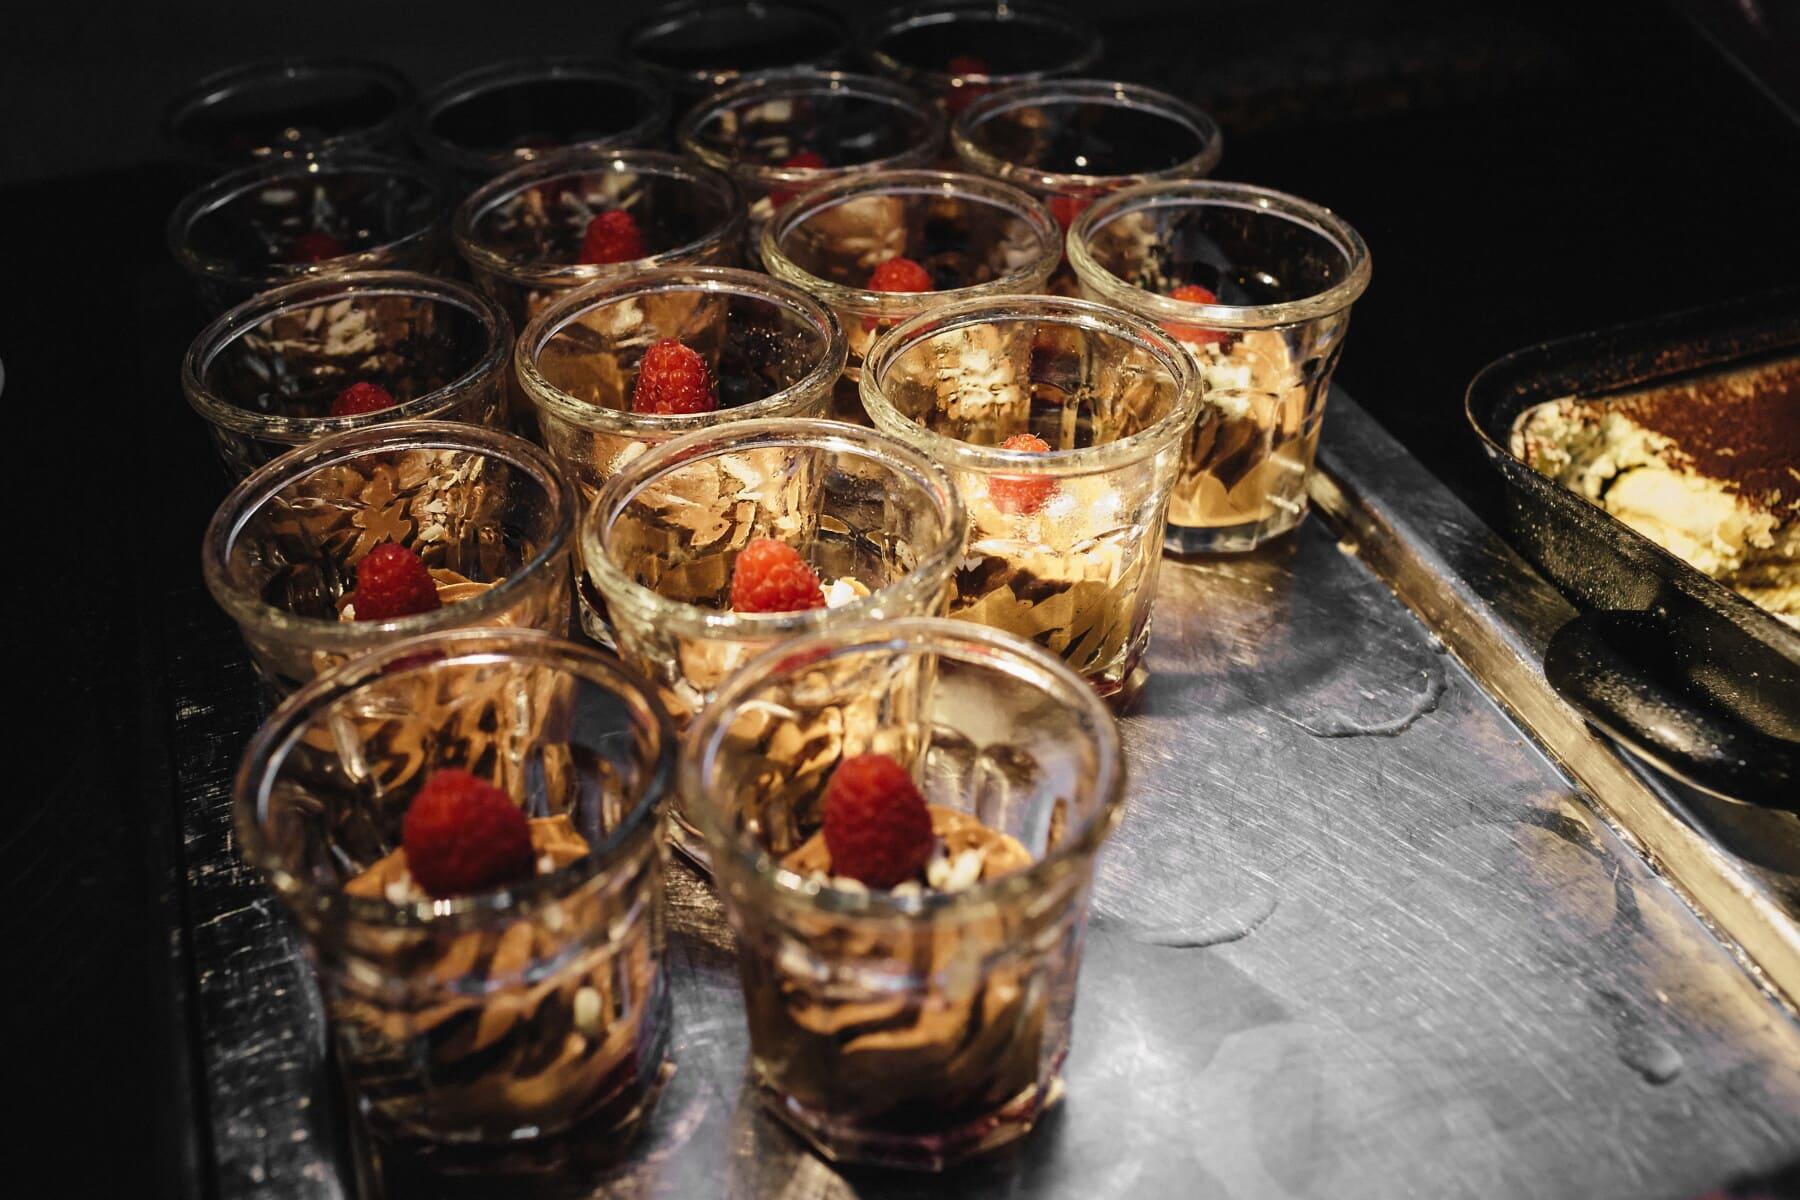 cinnamon, chocolate, cream, pudding, strawberry, dessert, restaurant, glass, drink, food